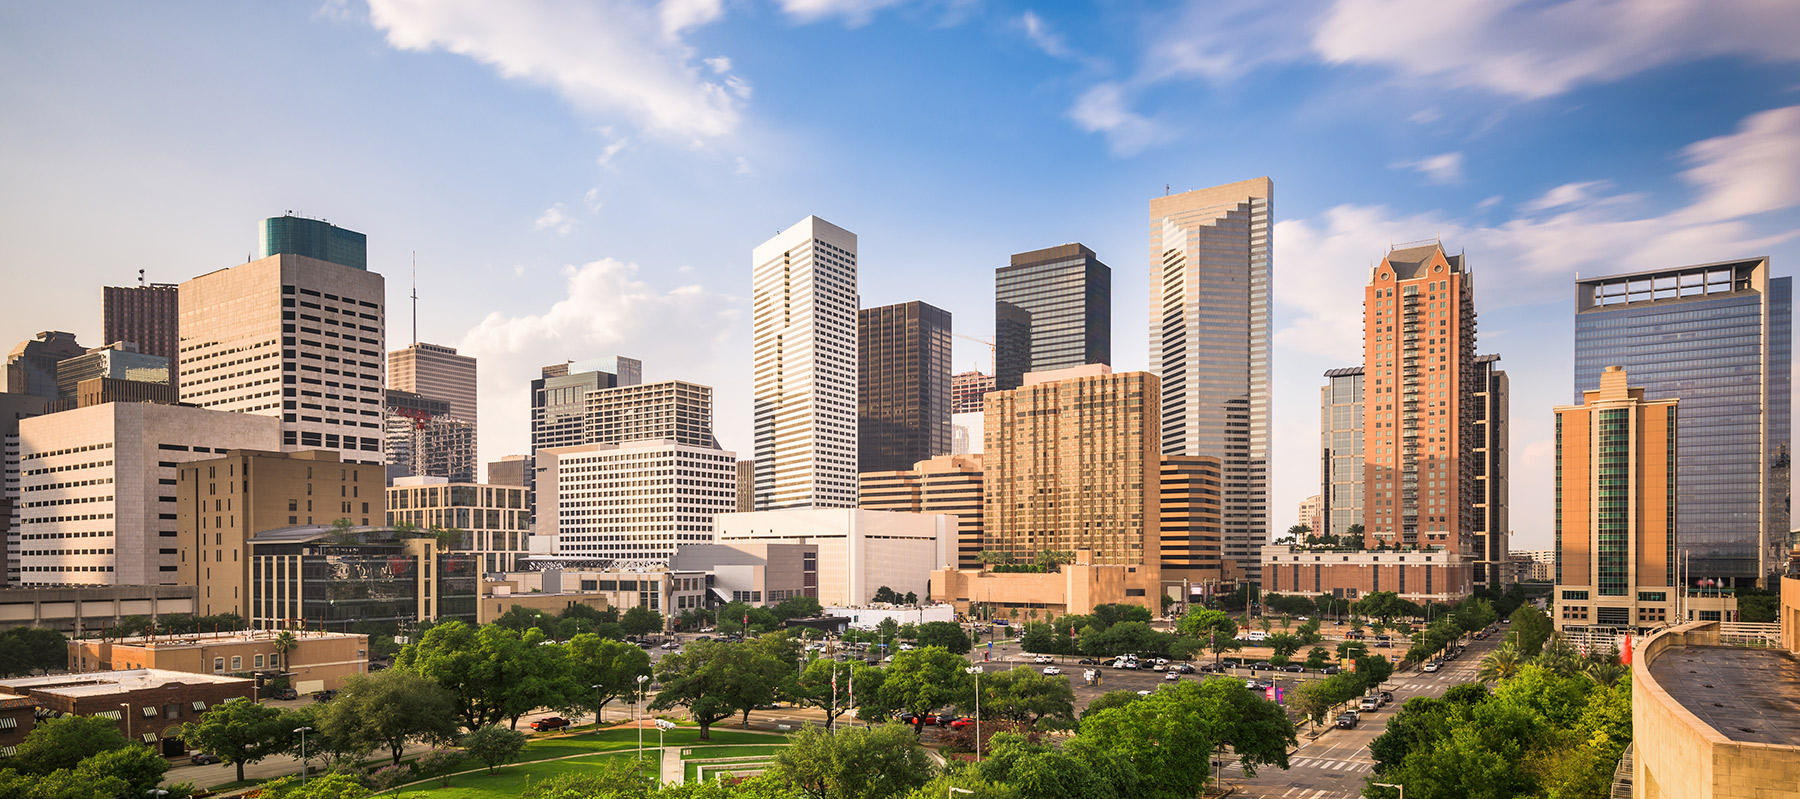 Image of Houston, TX